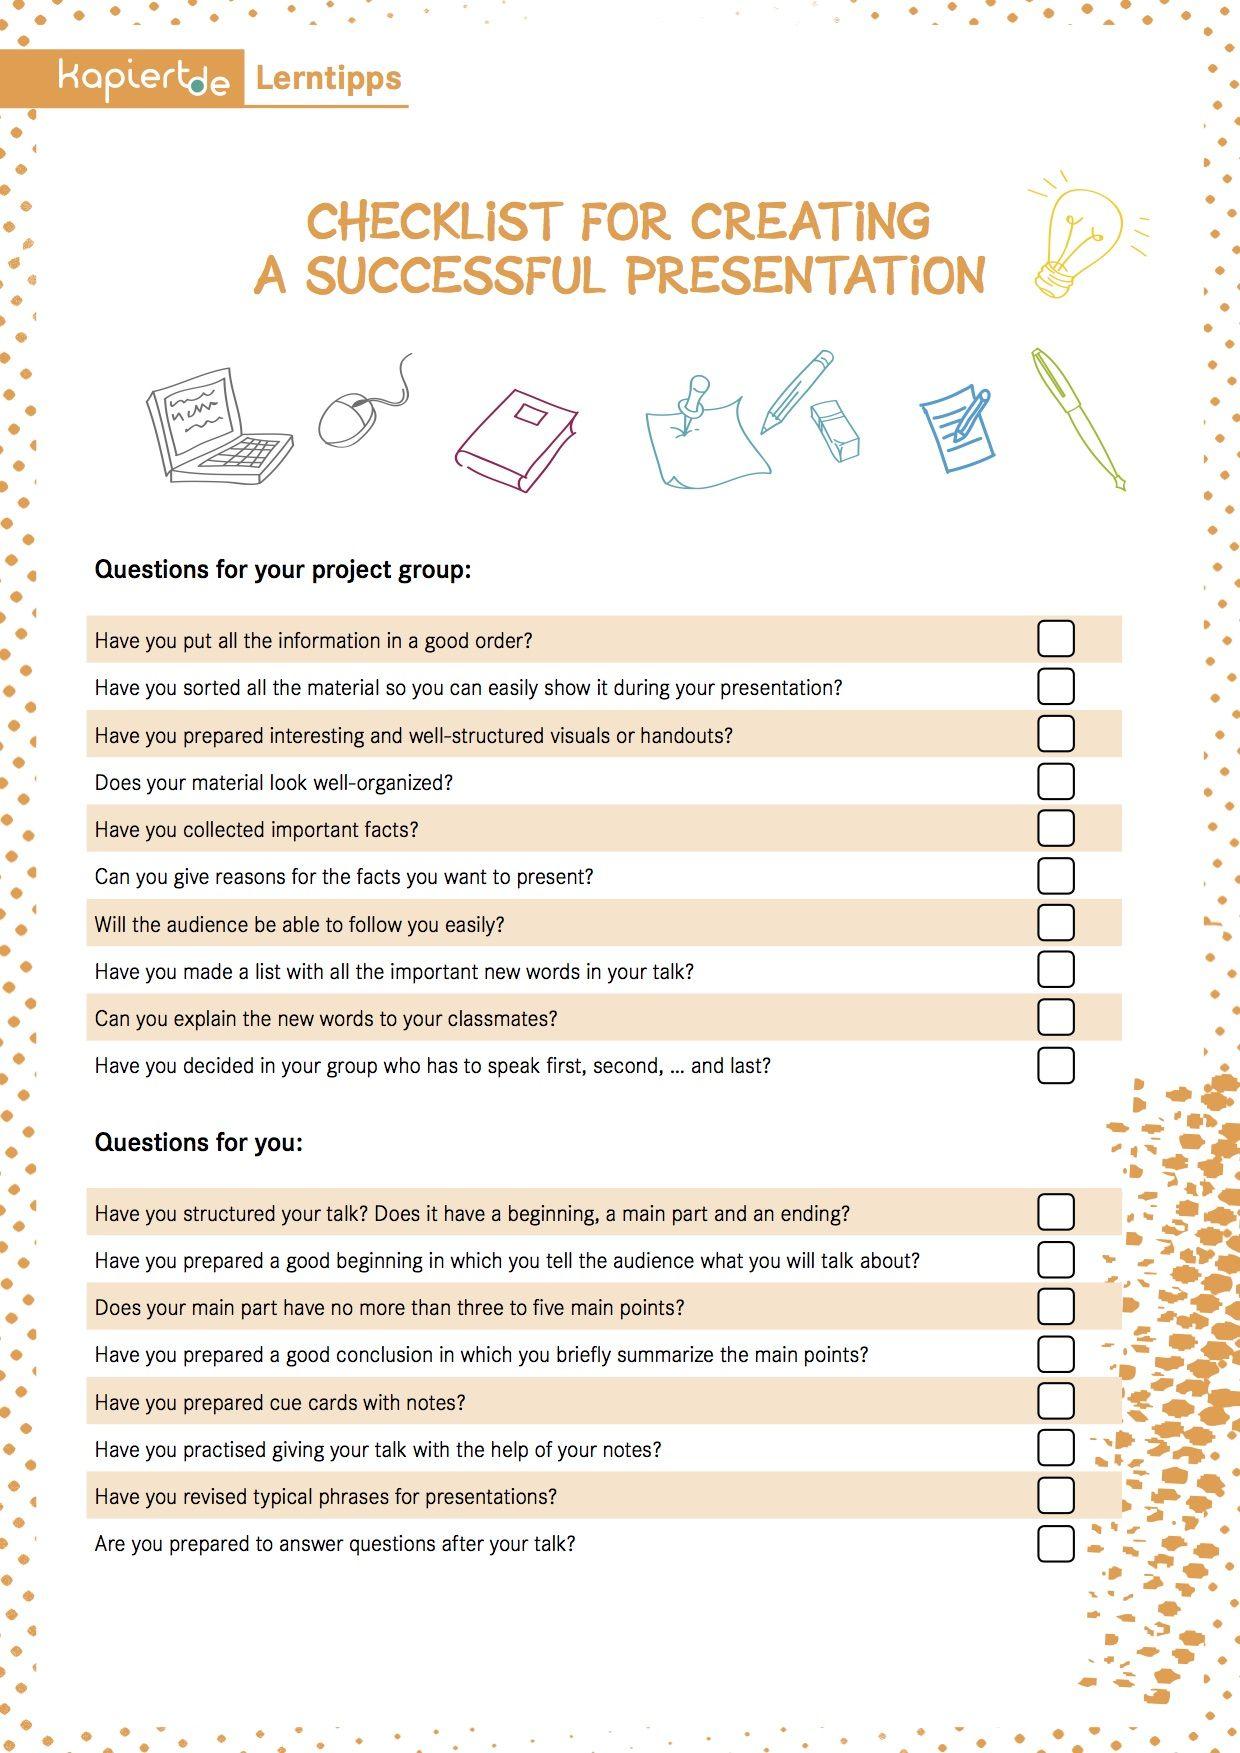 Checklist For A Successful Presentation Sprachen Lernen Lernen Referat